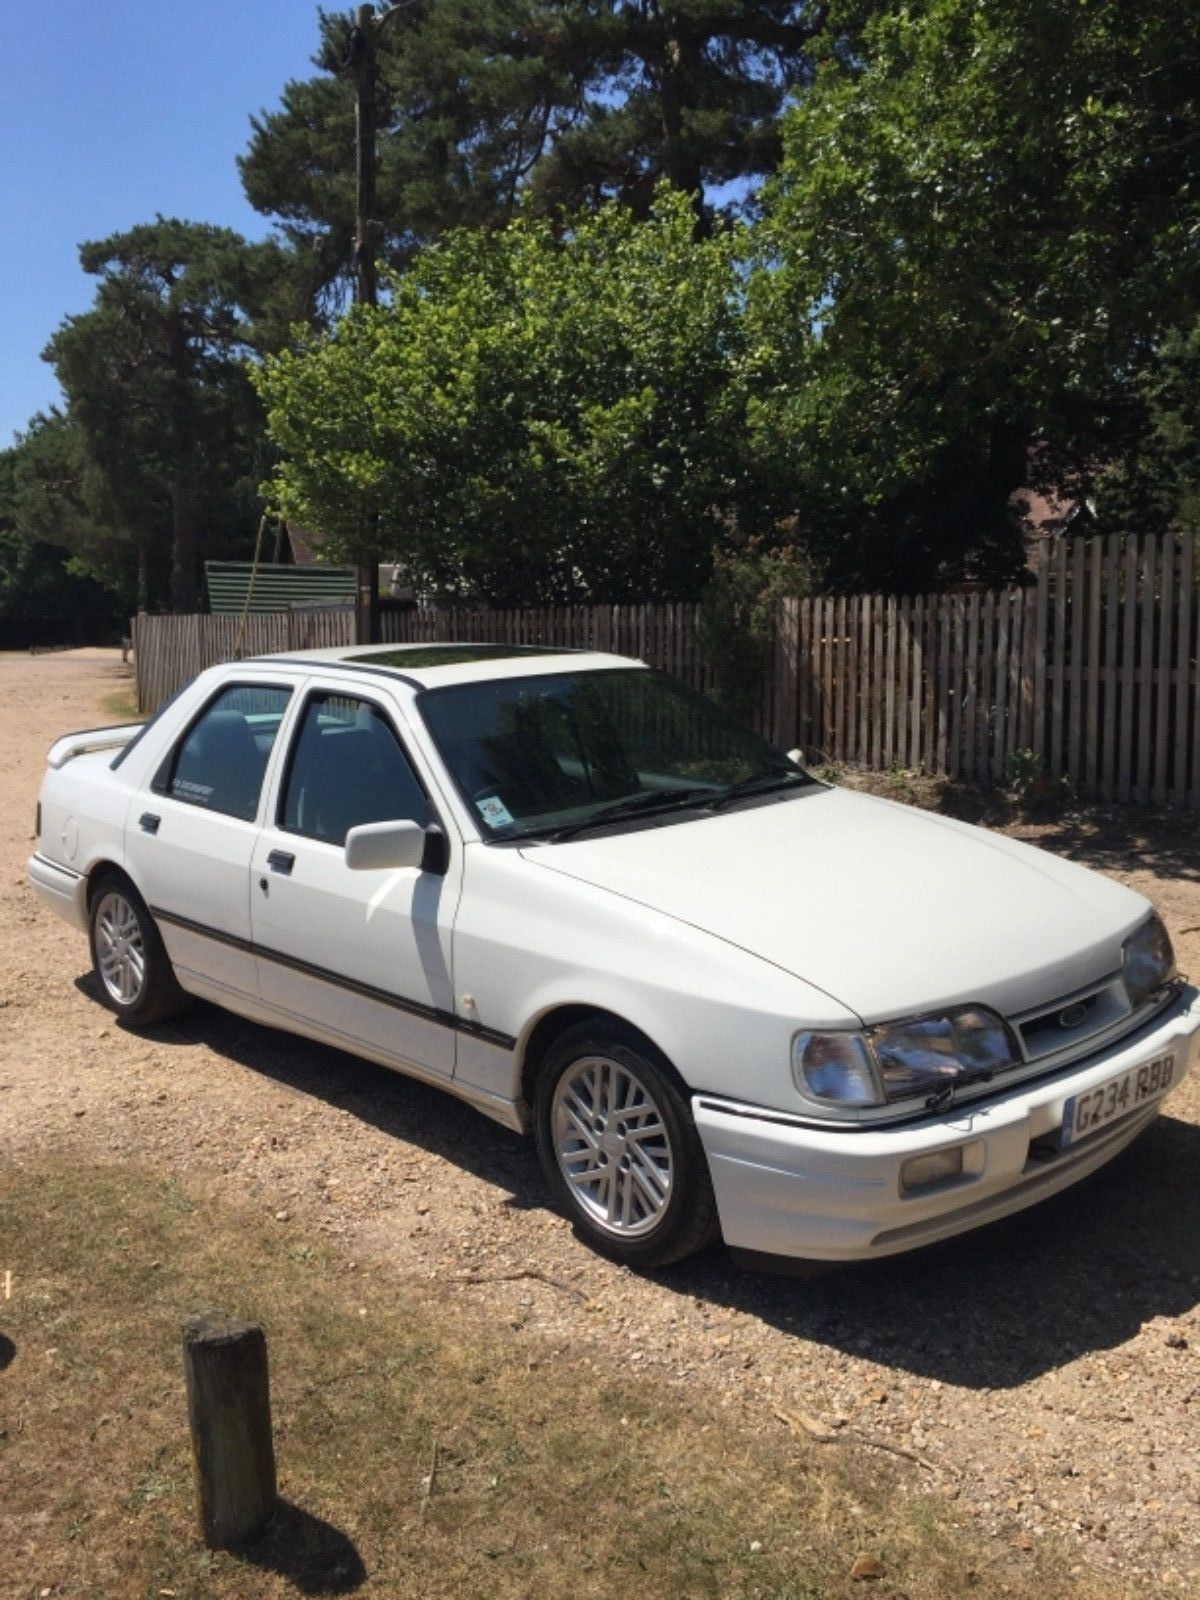 1989 Ford Sierra Sapphires Cosworth 2wd Diamond White Recaro Cloth Only 80k Ford Sierra Ford Recaro